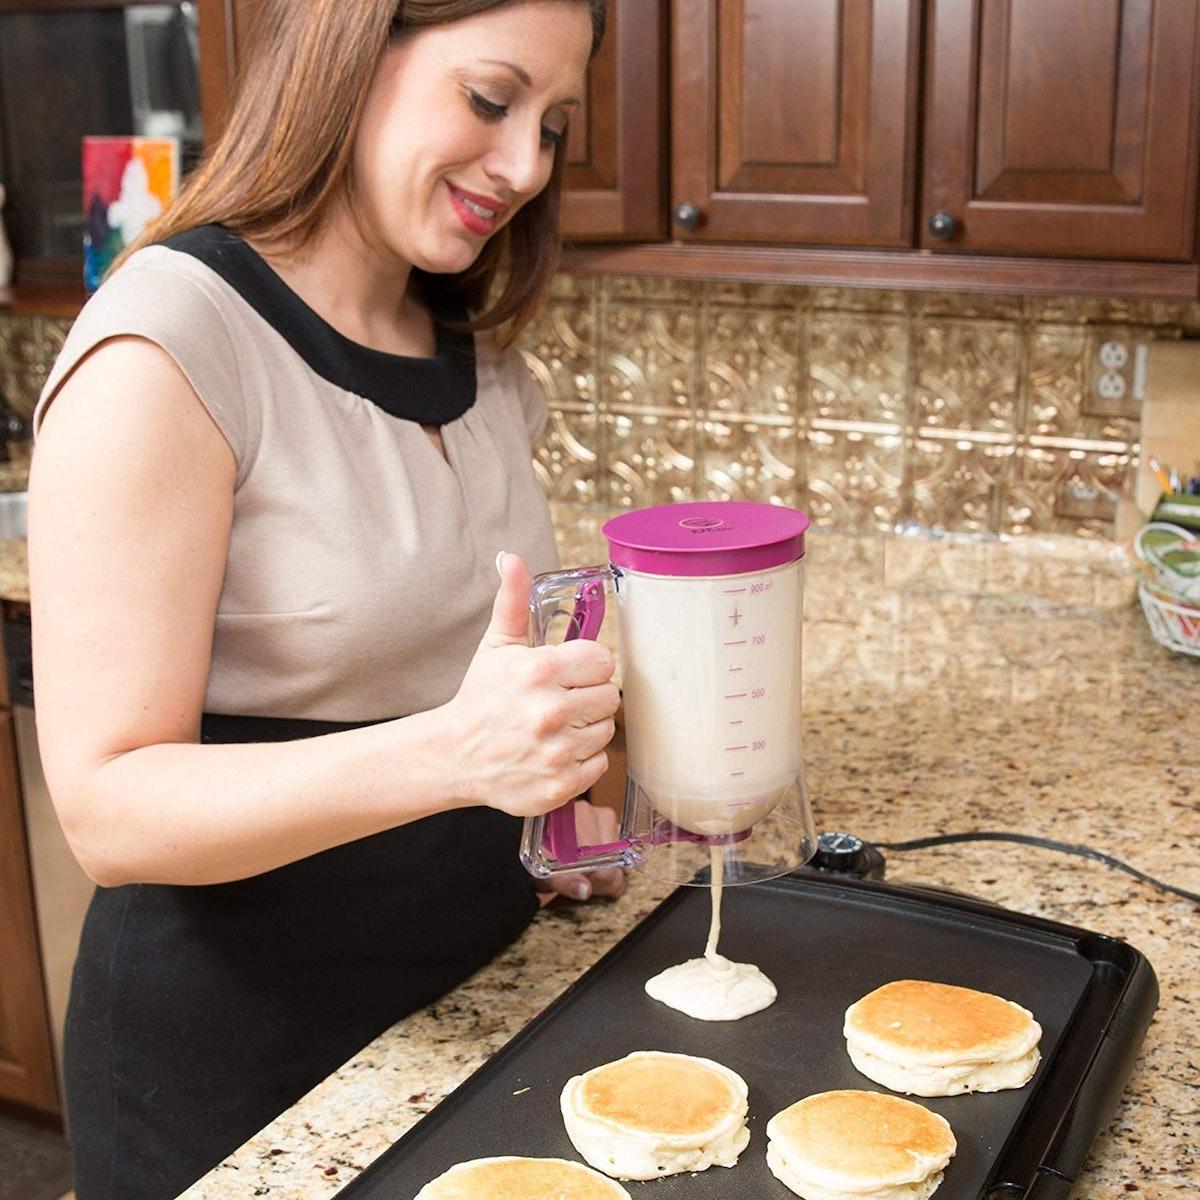 KPKitchen Pancake Batter Dispenser